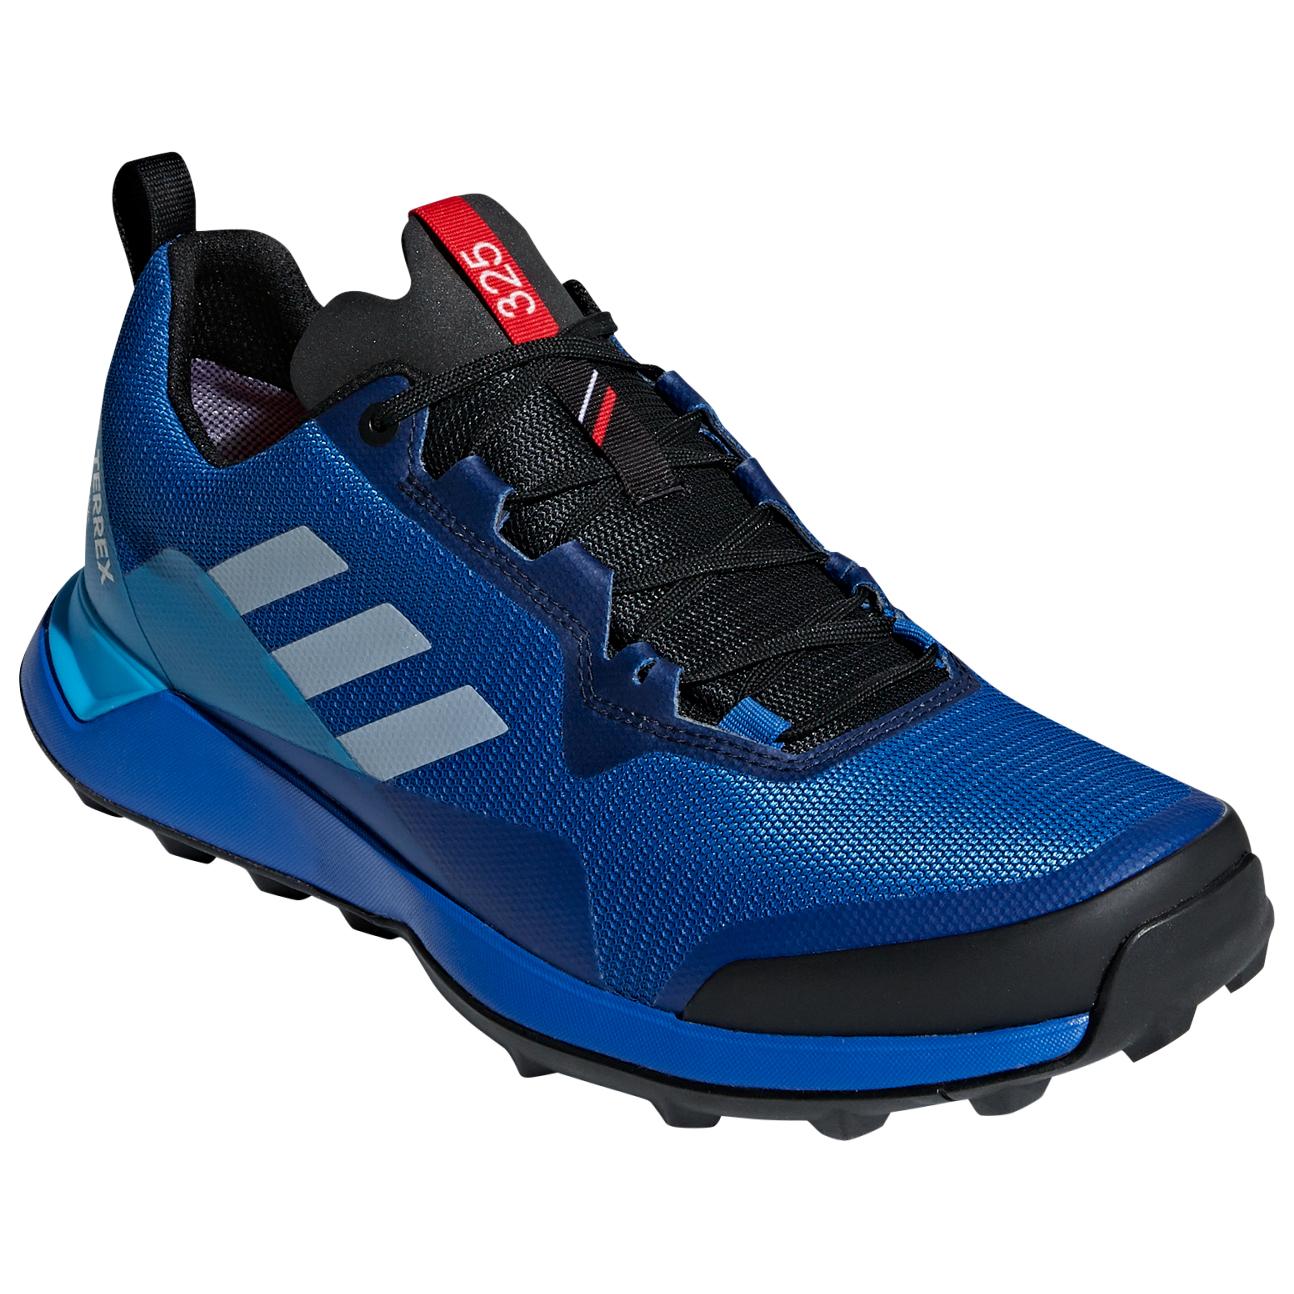 7b8a68b8 adidas - Terrex CMTK GTX - Zapatillas de trail running - Core Black / Core  Black / Grey Three F17 | 7 (UK)